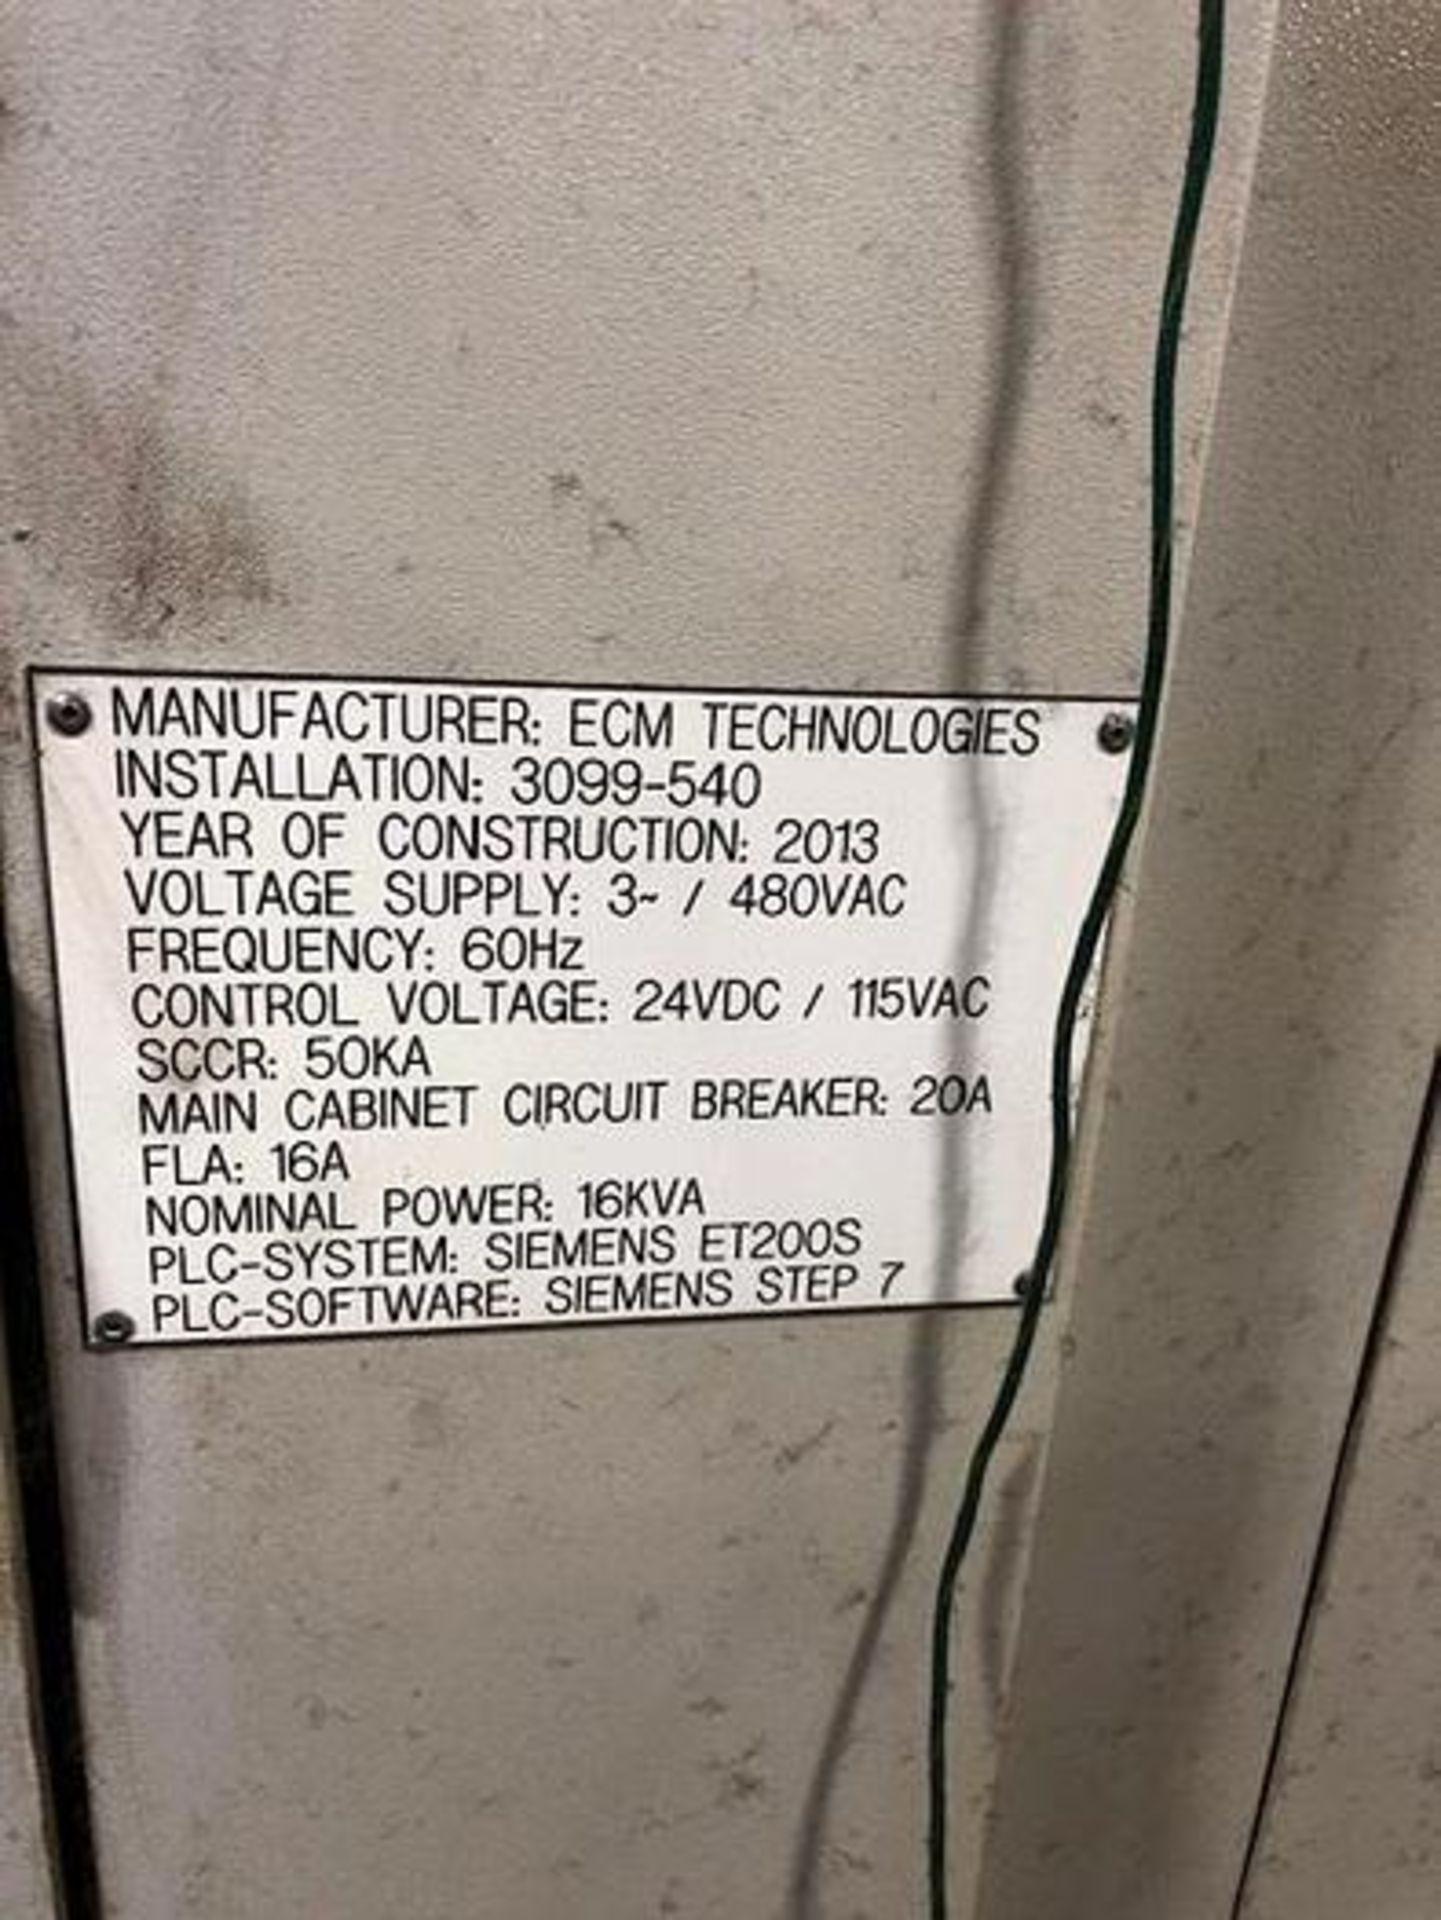 ECM TECHNOLOGIES VACUM CARBURIZING FURNACE, NEW 2013, SN 3100-500 - Image 31 of 50